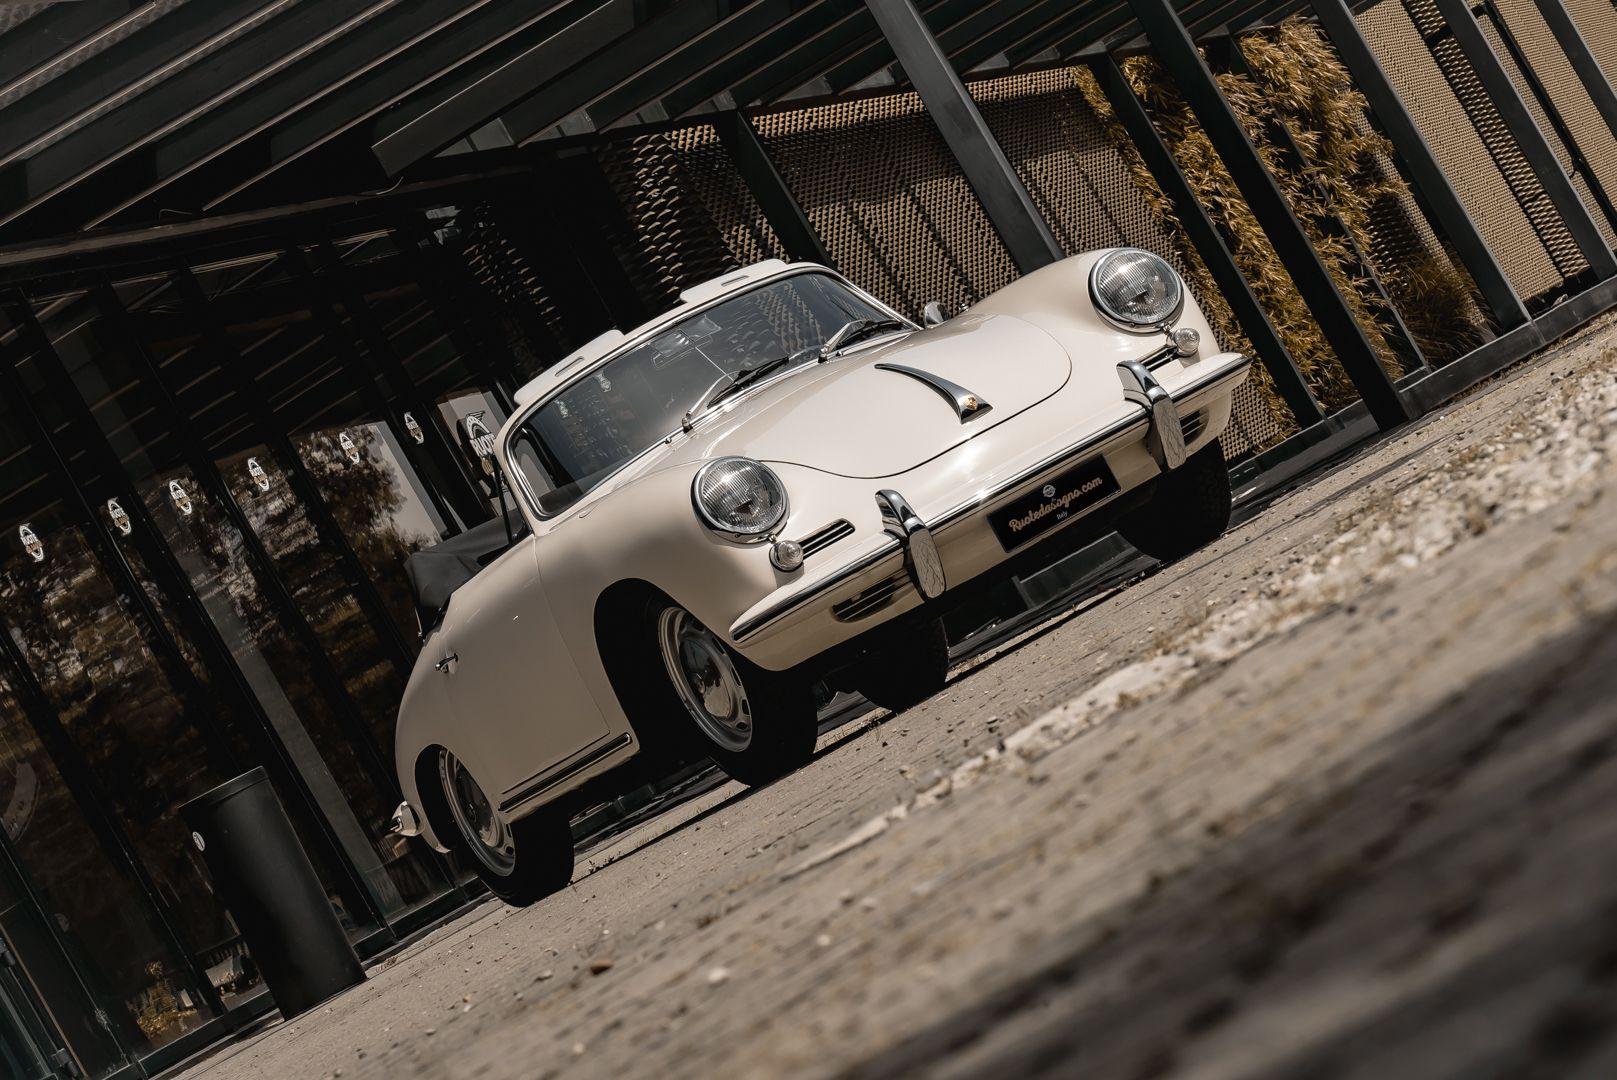 1964 PORSCHE 356 C Cabriolet 1600 SC 75433